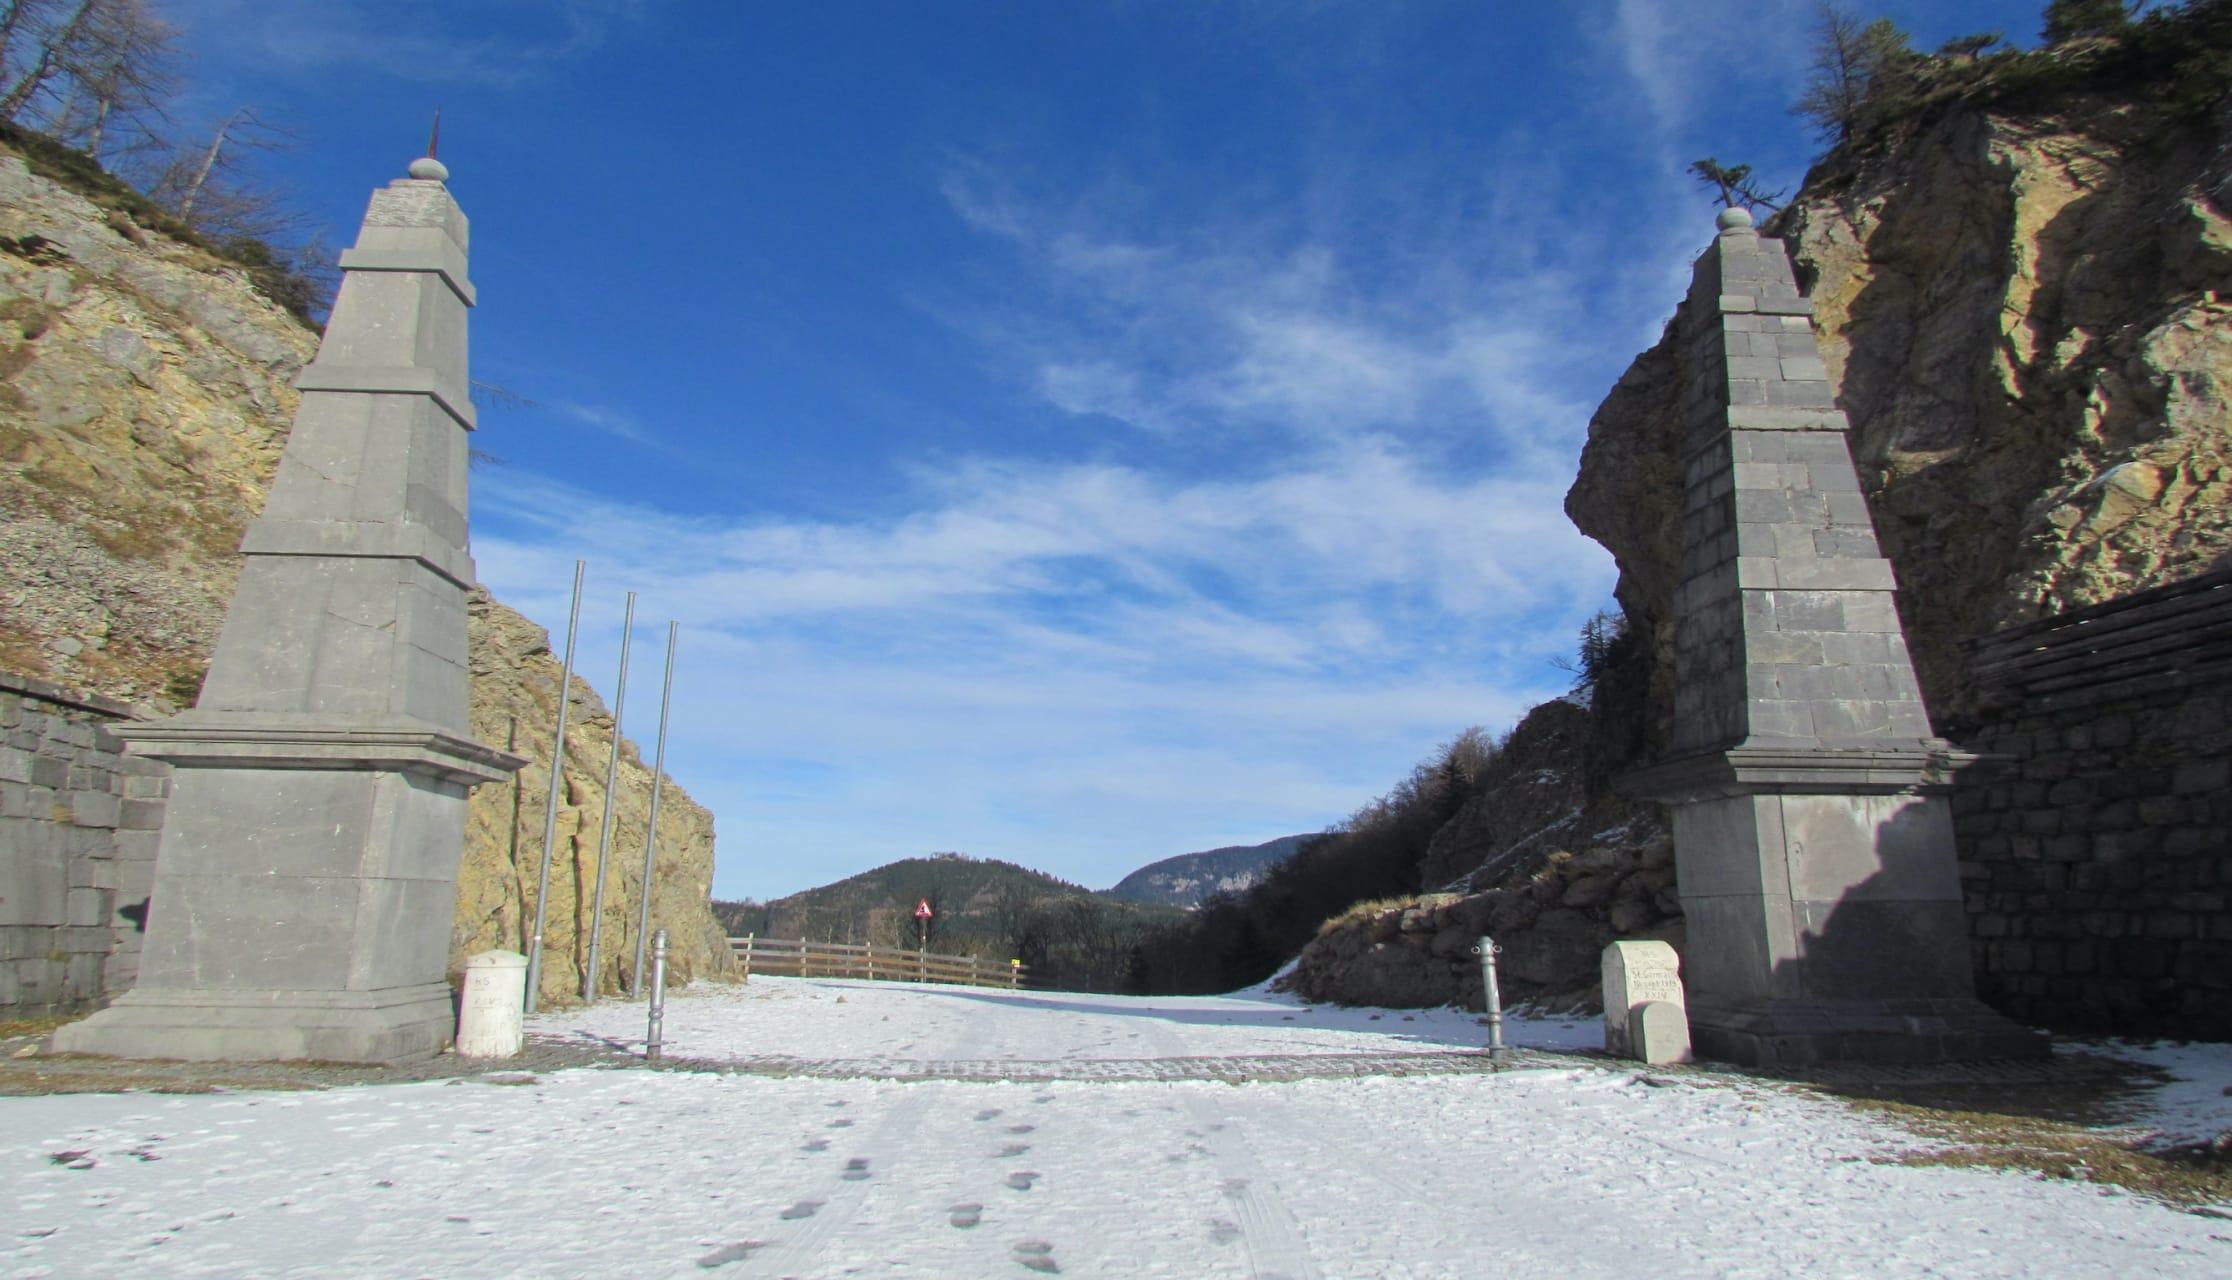 Tržič - Building the Ljubelj/Loibl Tunnel - WW2 Concentration Camp in Slovenia